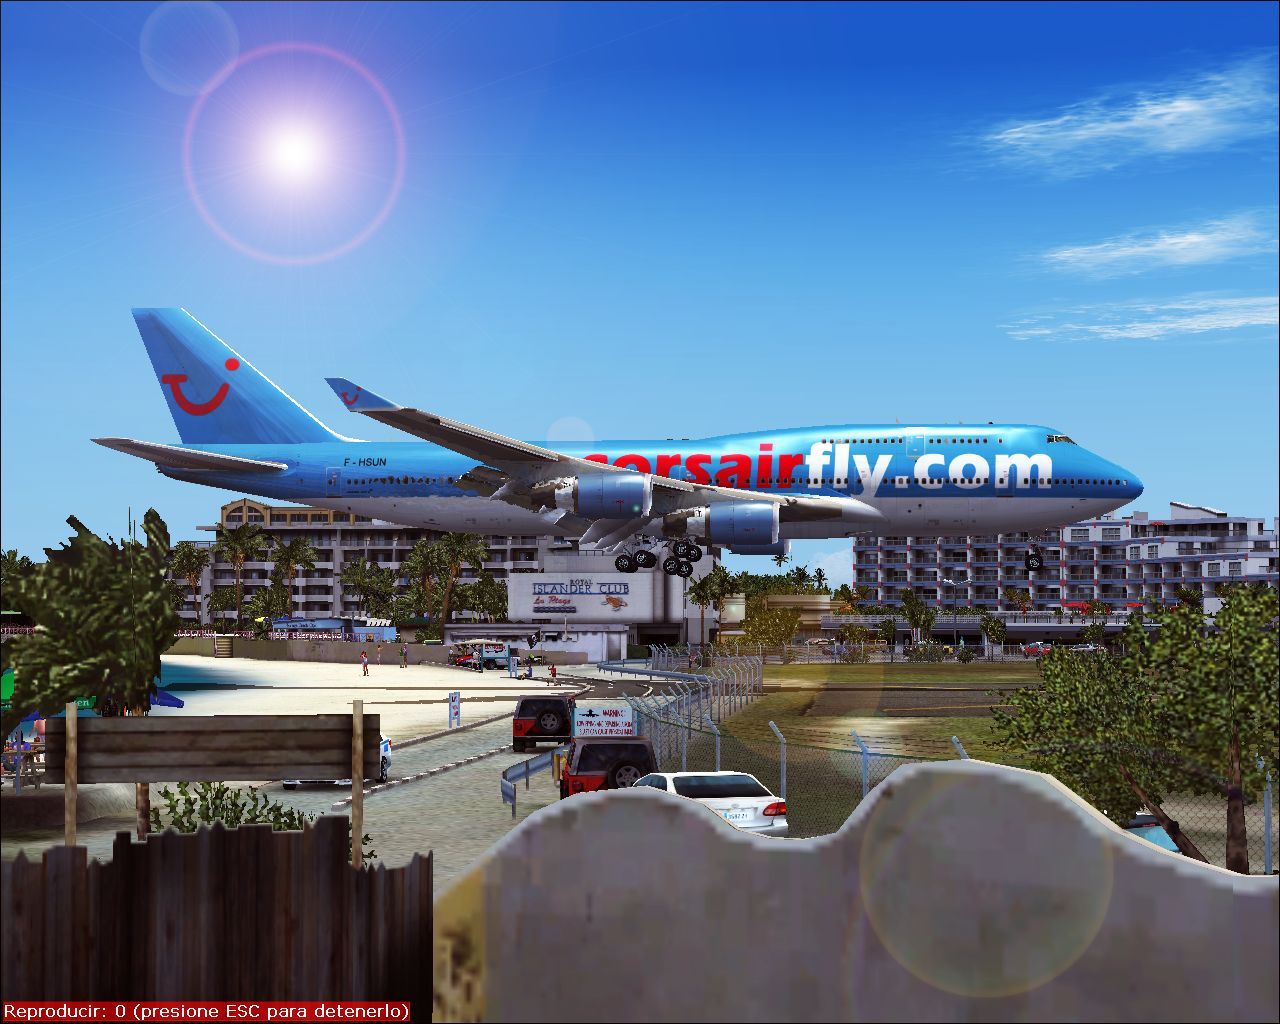 http://1.bp.blogspot.com/-KyyyIY6lfbk/T2sPeLozJCI/AAAAAAAAAtg/fkT_V5ym5Xs/s1600/Corsairfly+avion+747.jpg